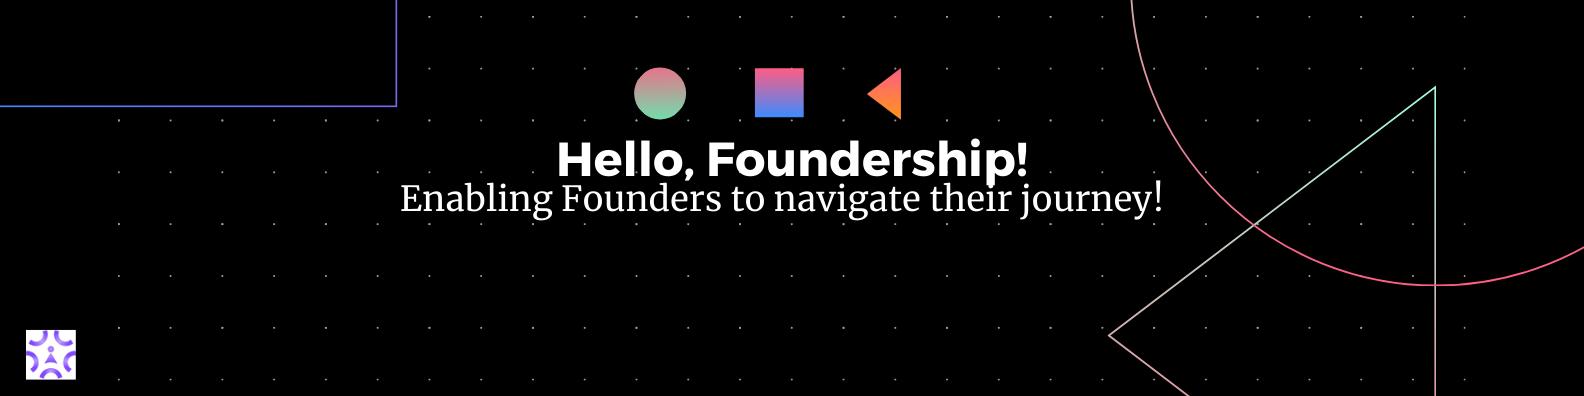 Hello Foundership!